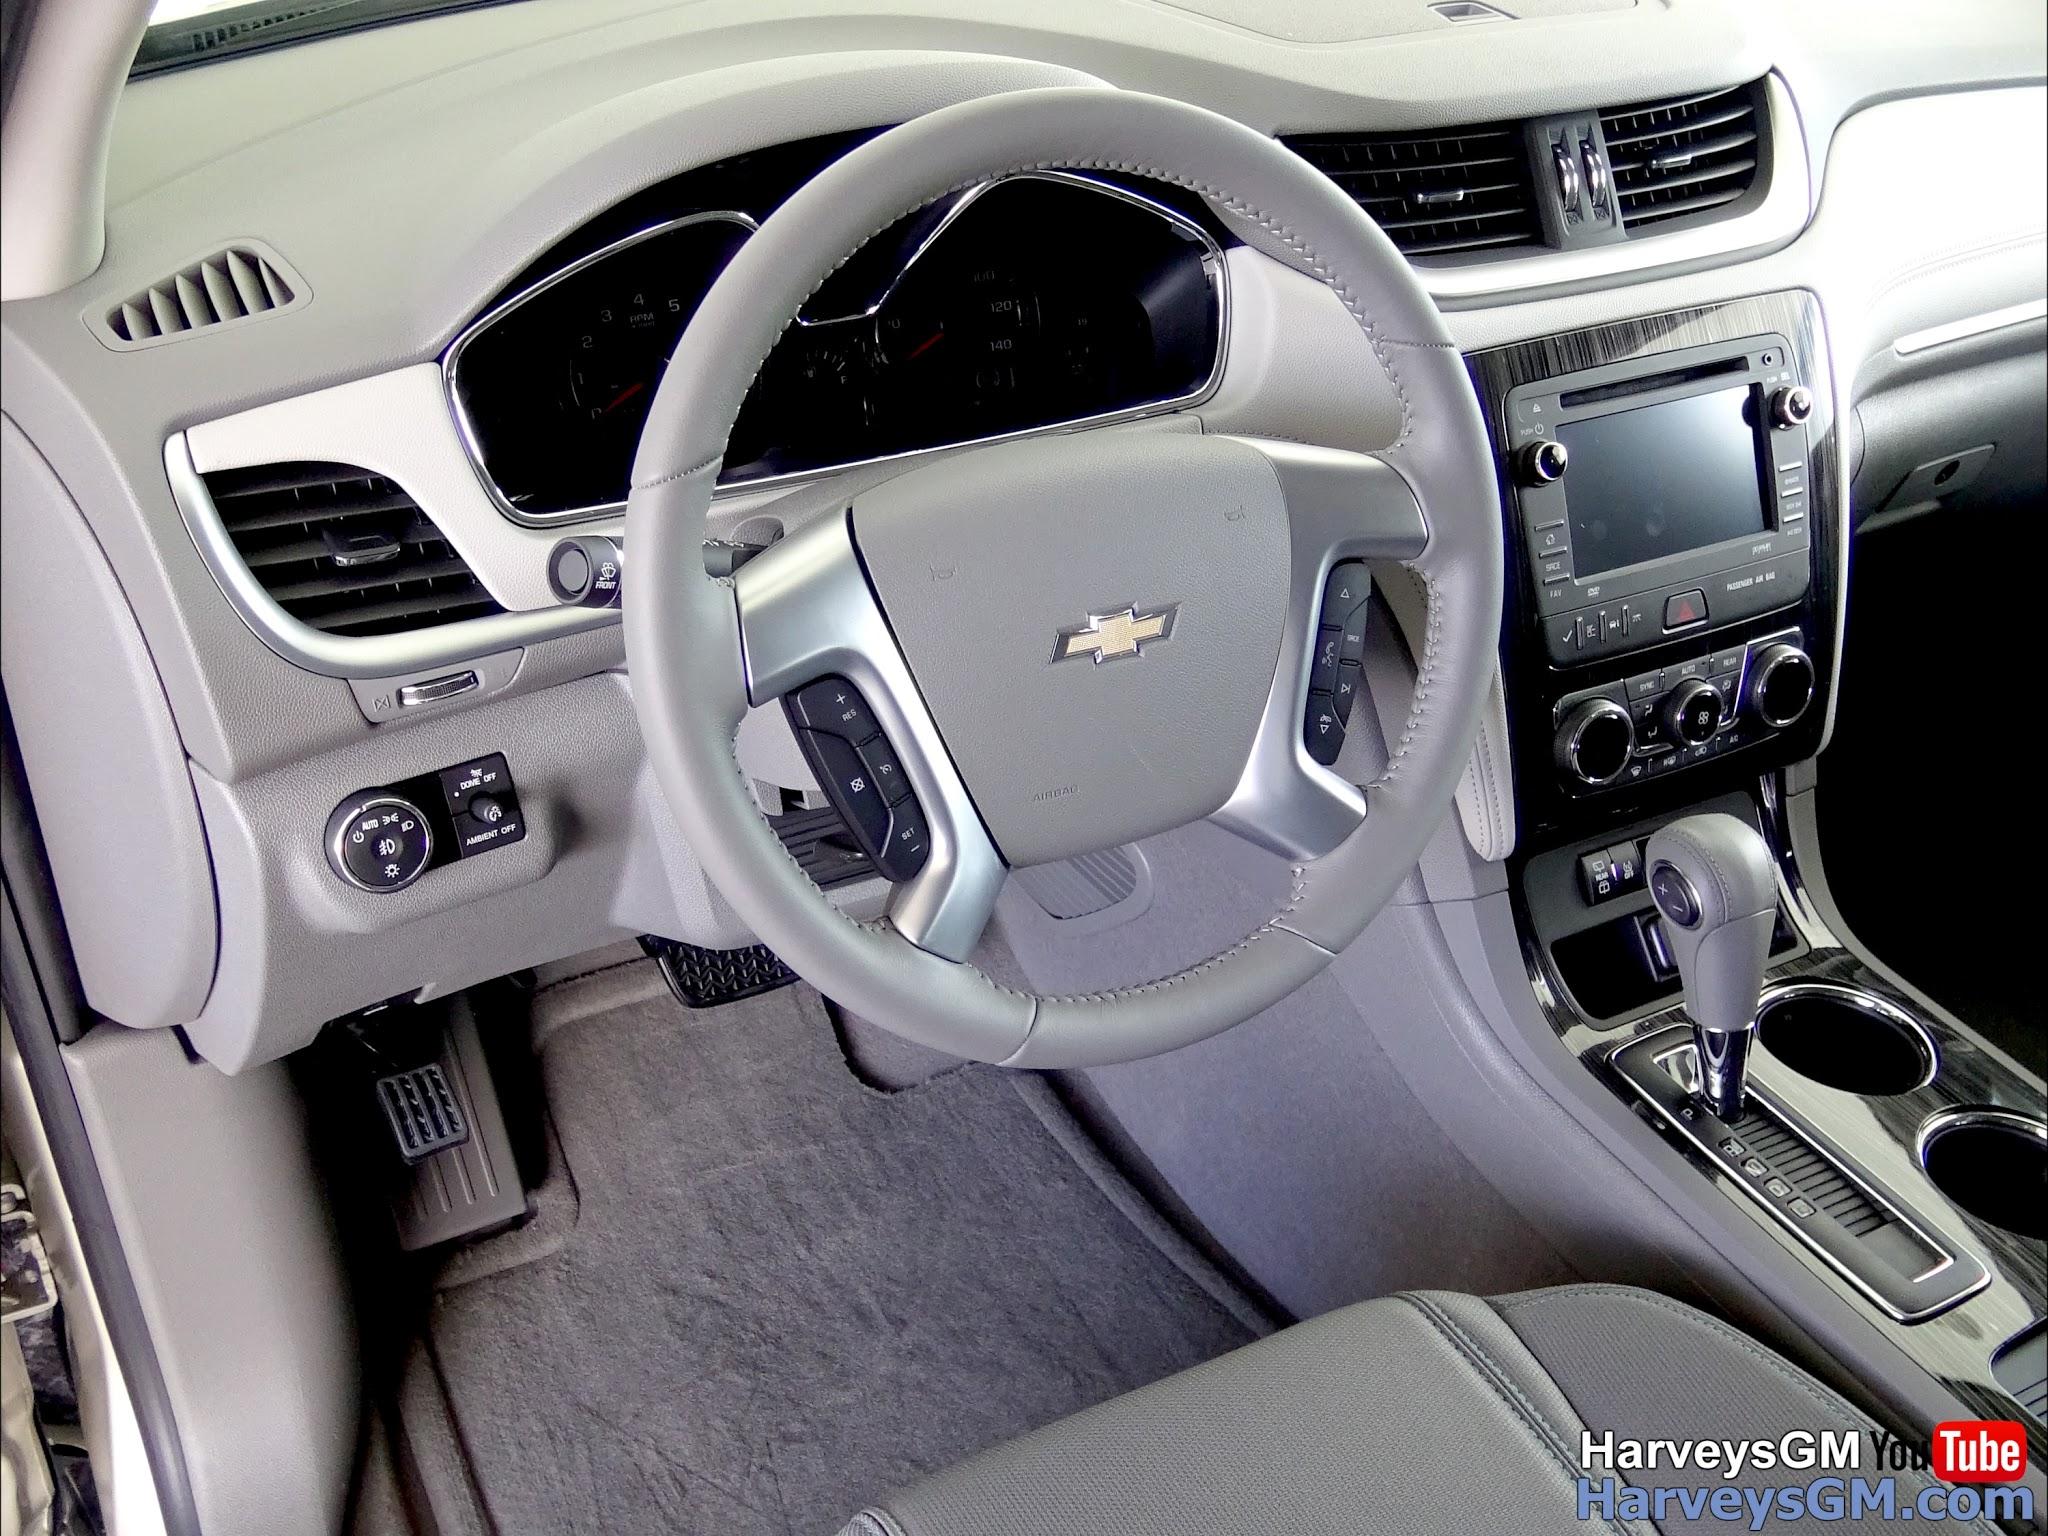 2017 Chevy Traverse Awd 1lt Chevrolet Harvey S Gm Radford Virginia Colo